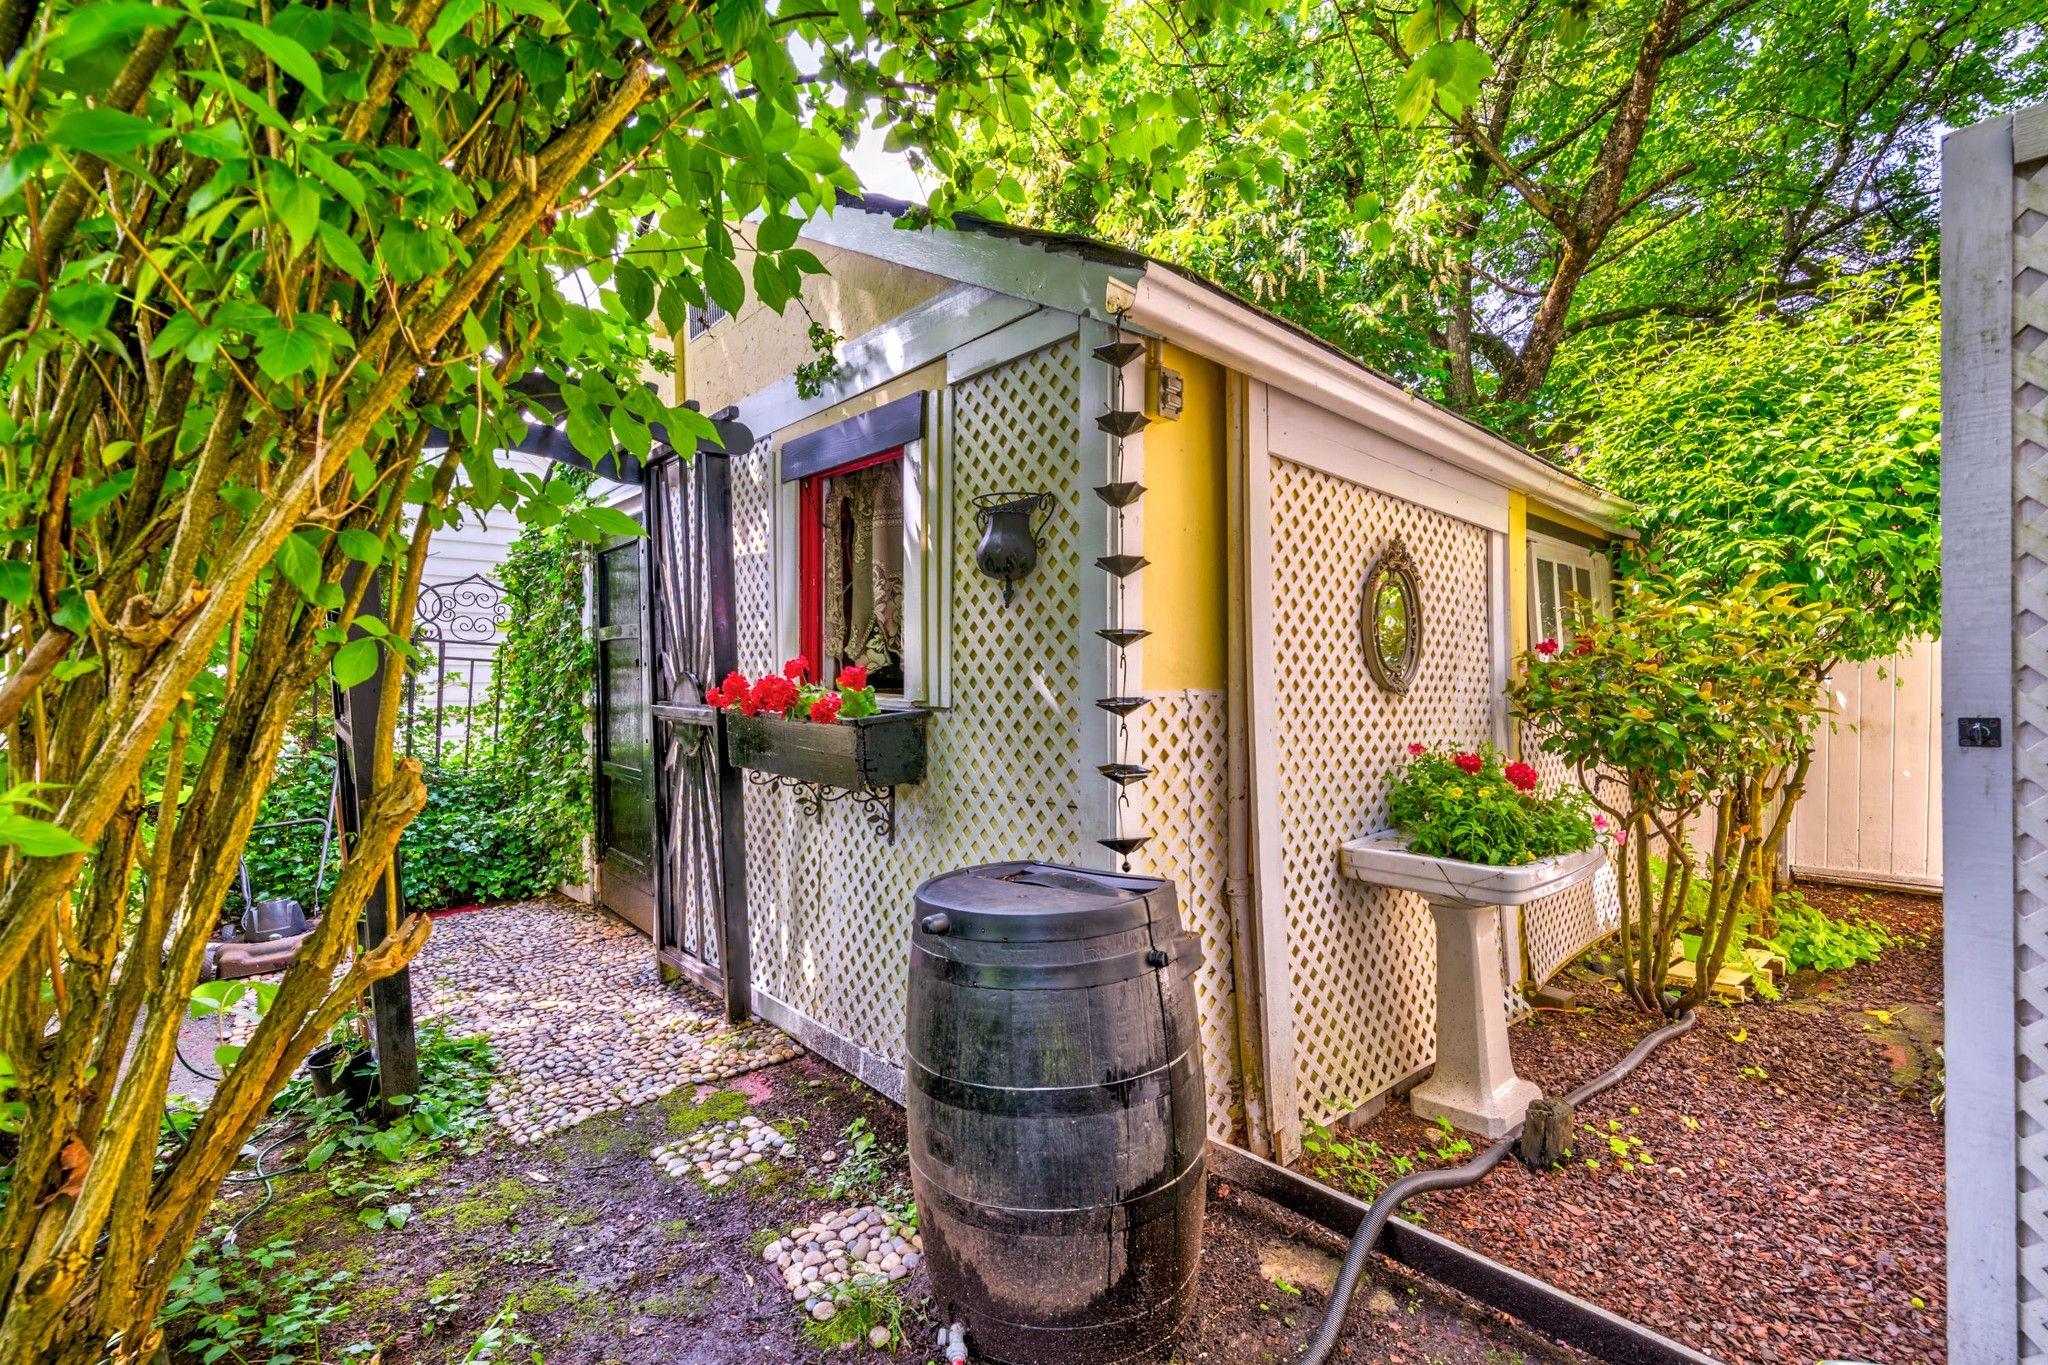 Photo 27: Photos: 20623 114 Avenue in Maple Ridge: Southwest Maple Ridge House for sale : MLS®# R2465656